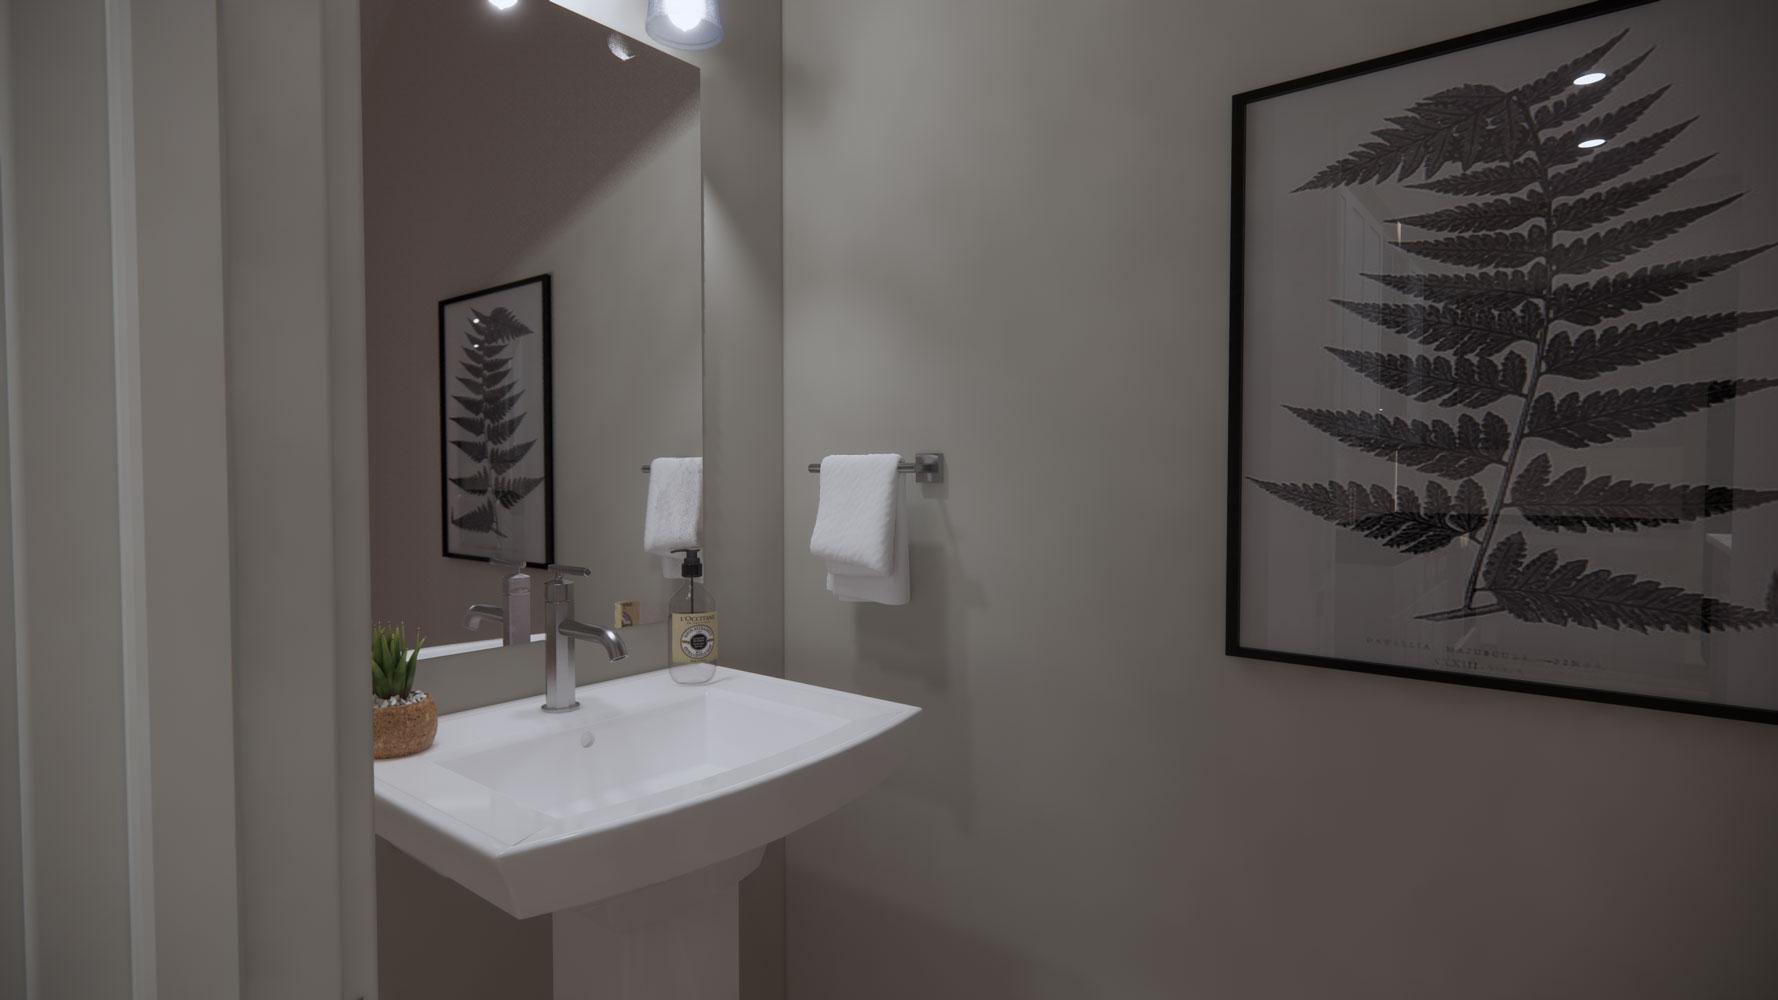 Bathroom Sink at Echelon at Reverchon Bluffs  in Dallas, Texas